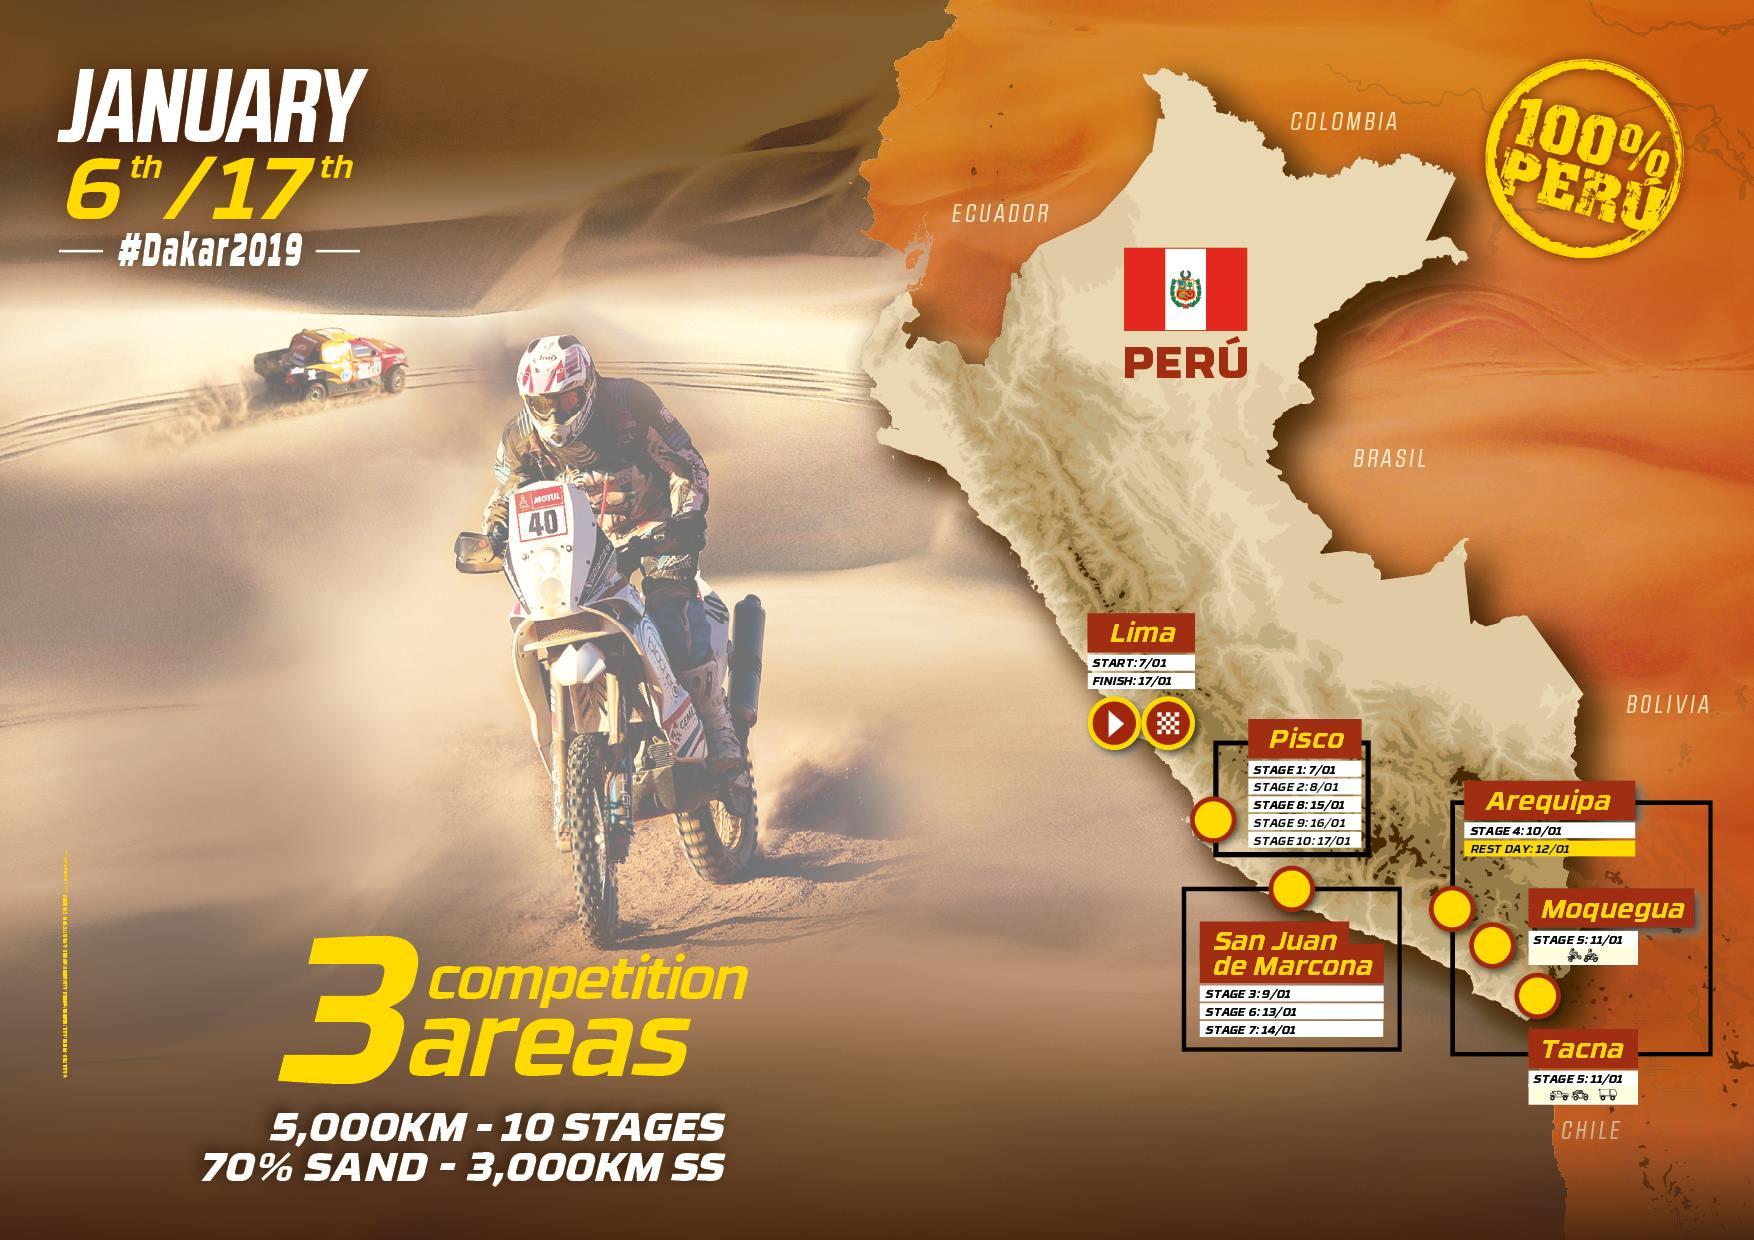 Dakar Rally 2019 route